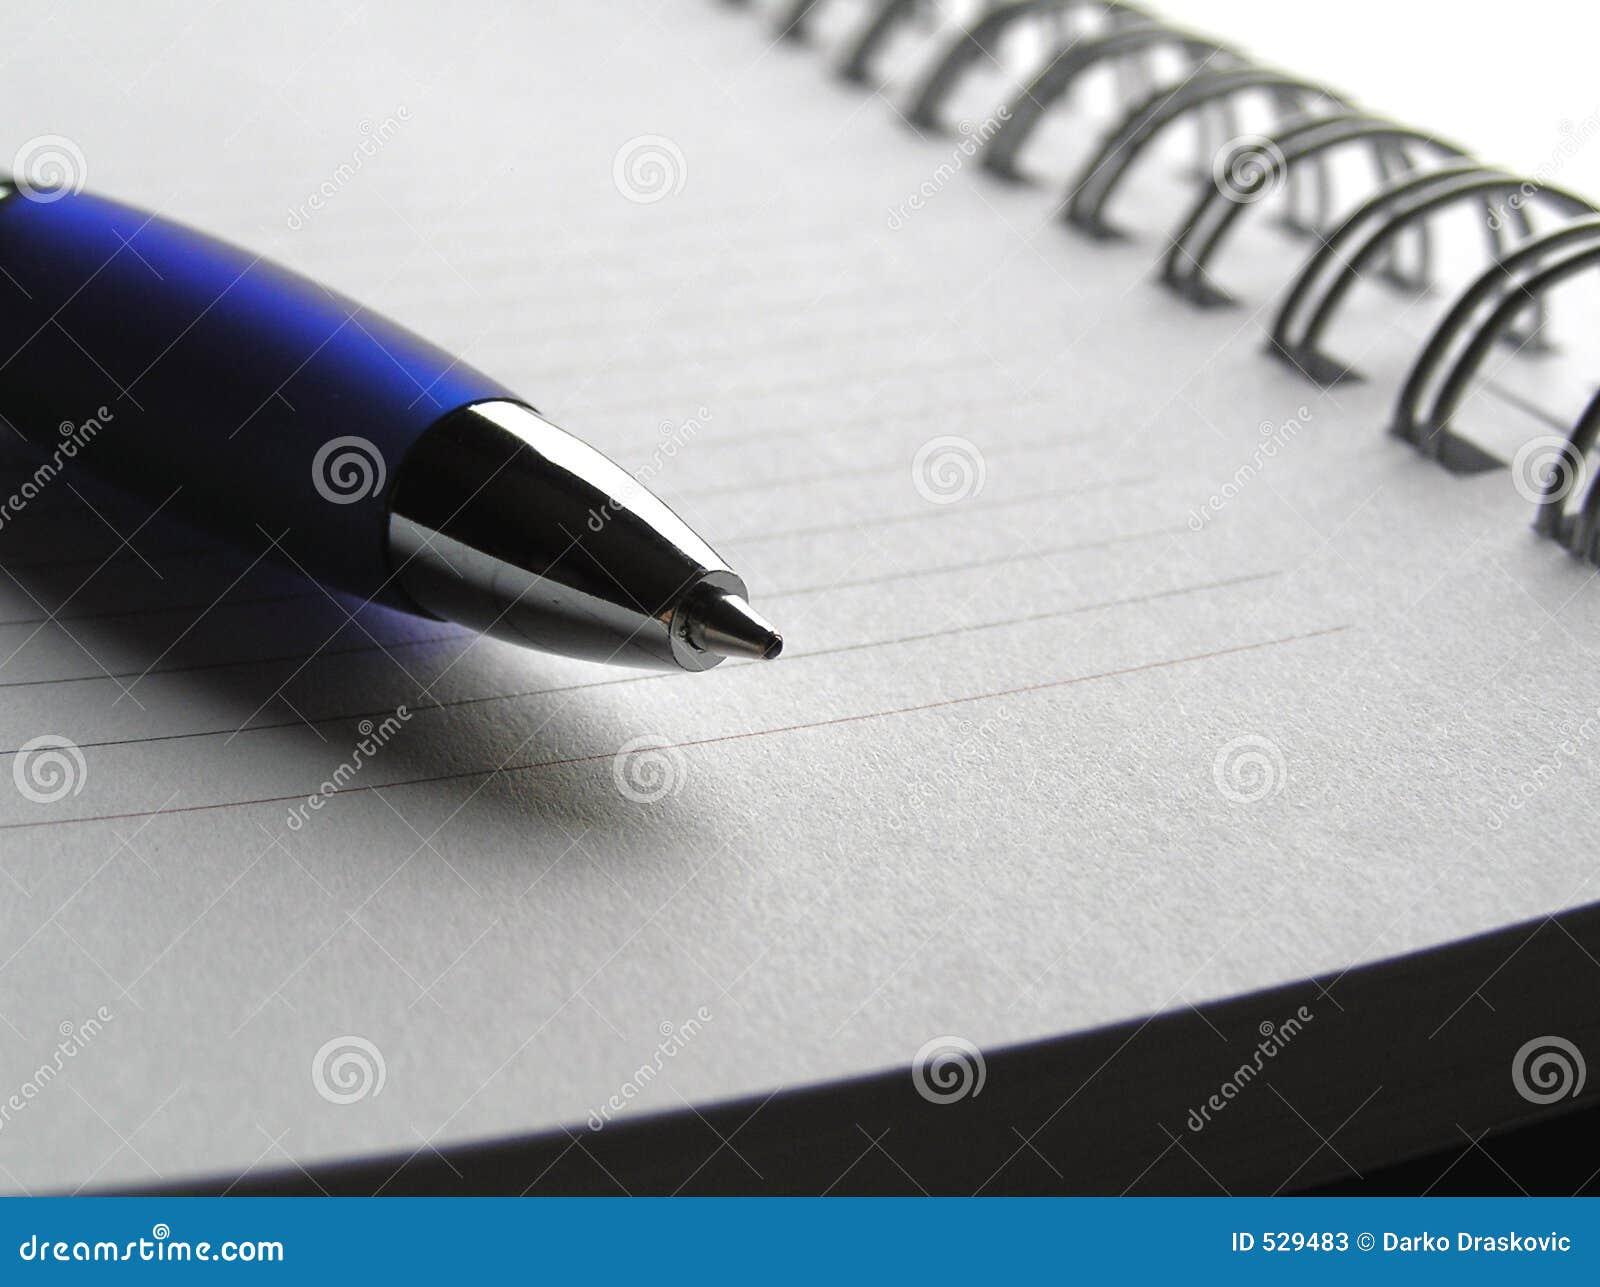 Download 4笔访笔 库存图片. 图片 包括有 附注, 钉书匠, 文字, 写道, 蓝色, 优秀, 日记帐, 了解, 文书工作 - 529483